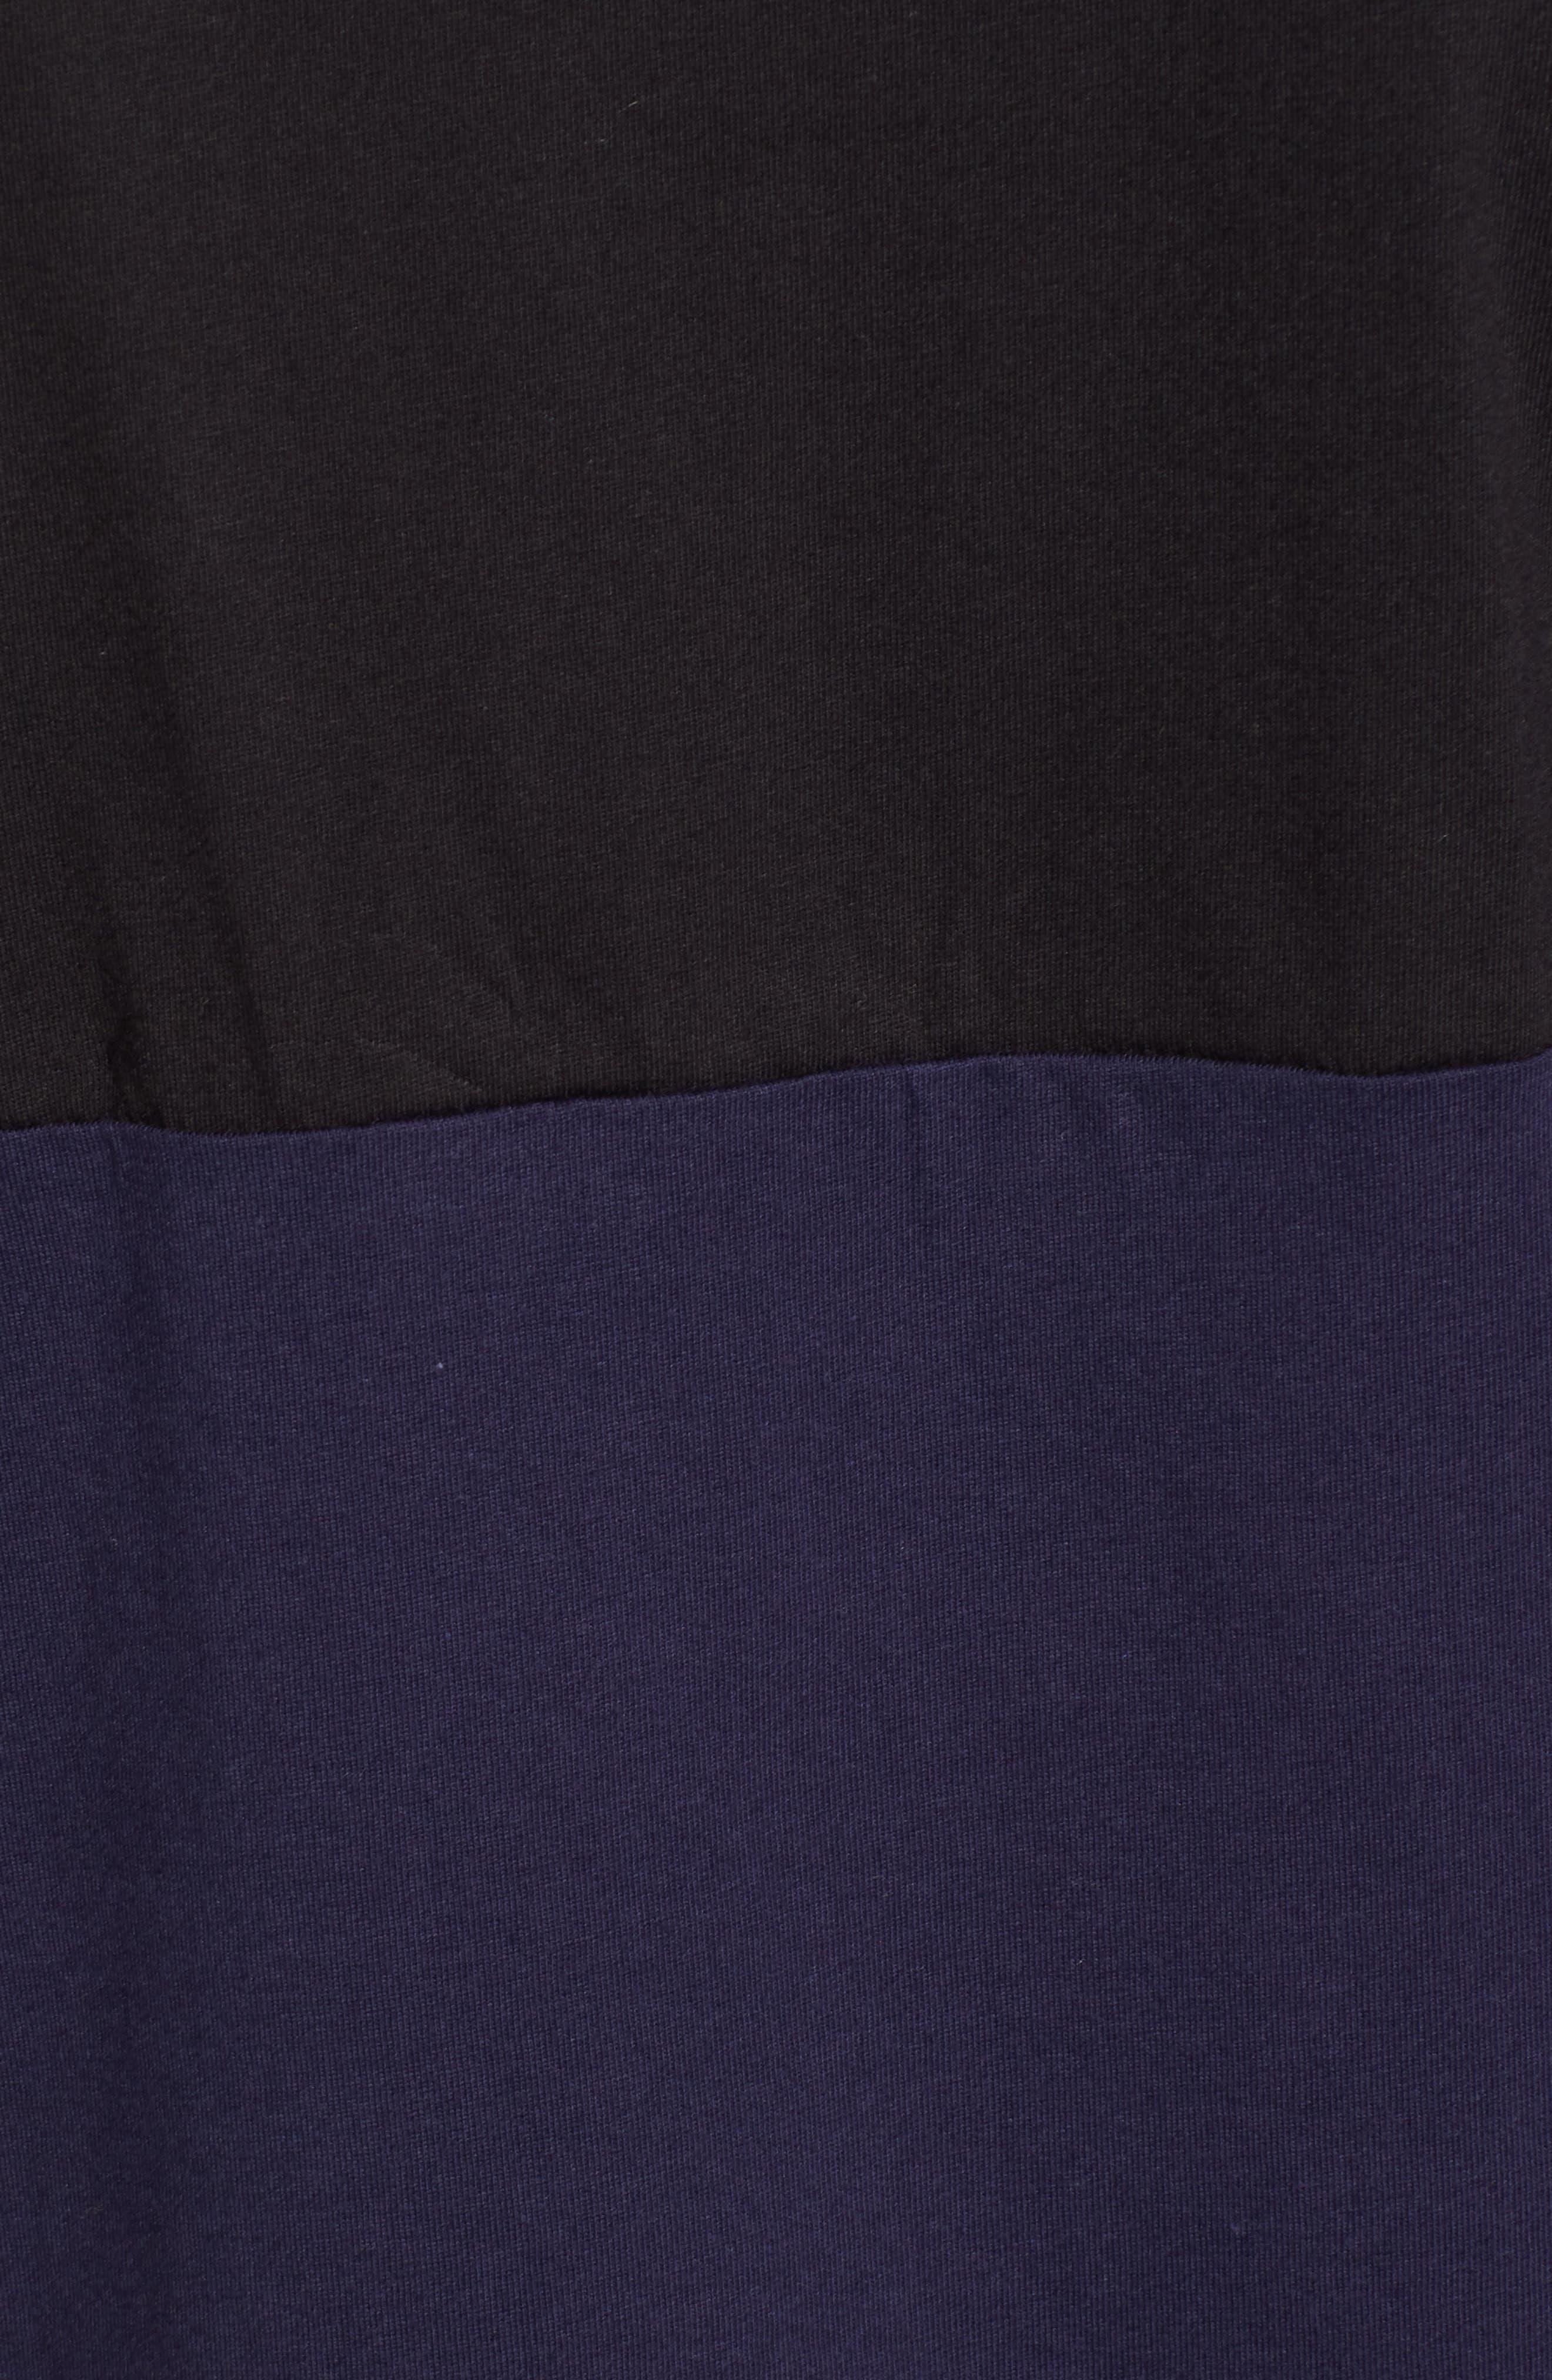 Half Stripe Crewneck T-Shirt,                             Alternate thumbnail 5, color,                             Black/ Blue Blood